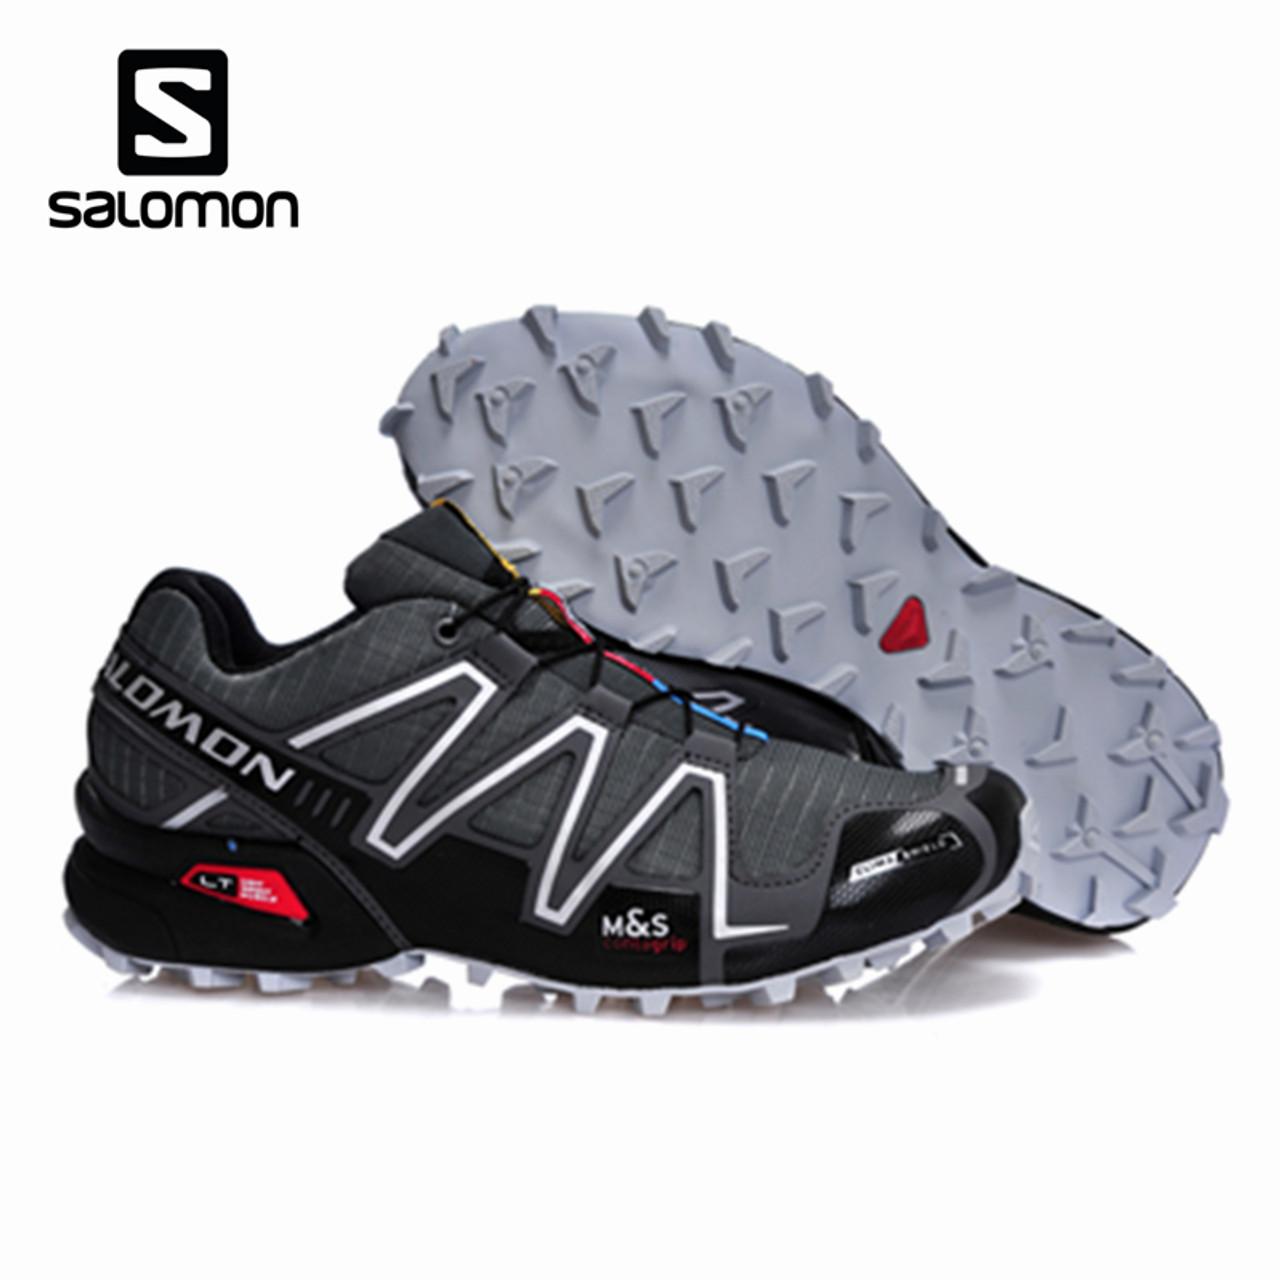 magasin d'usine 786f7 6131e Salomon Speed Cross 3 CS Men Outdoor Sport Shoes Breathable Sneakers  zapatillas Hombre Male Speedcross 3 Fencing Shoes